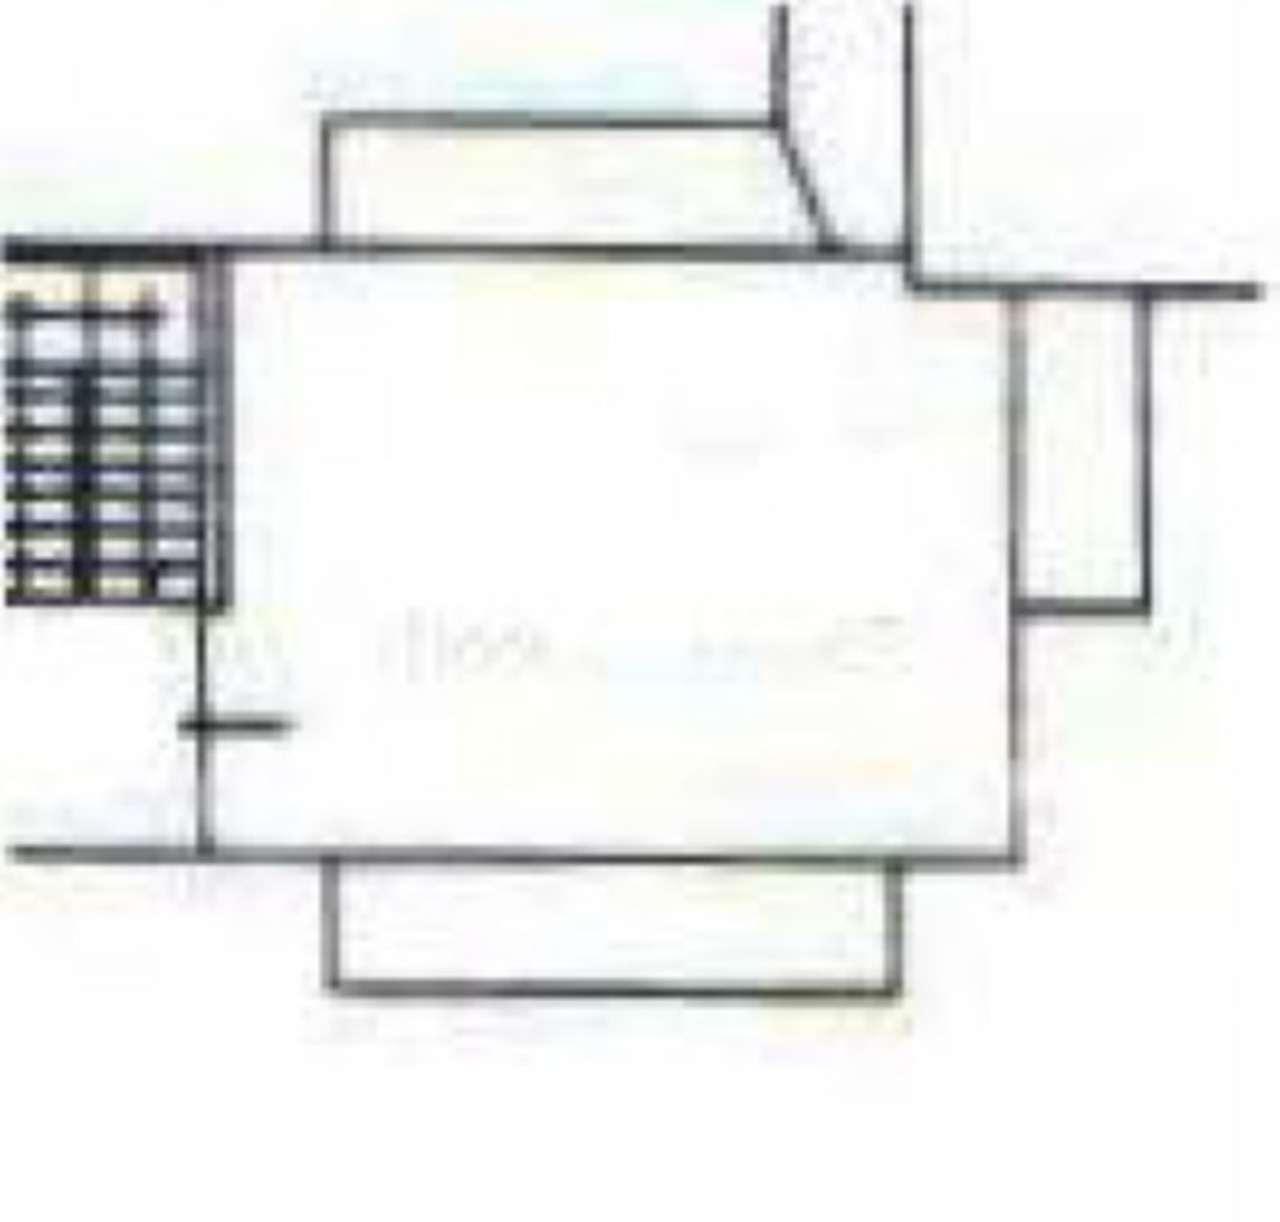 Vendita  bilocale Garlasco Piazza Unita' D'italia 1 1029791